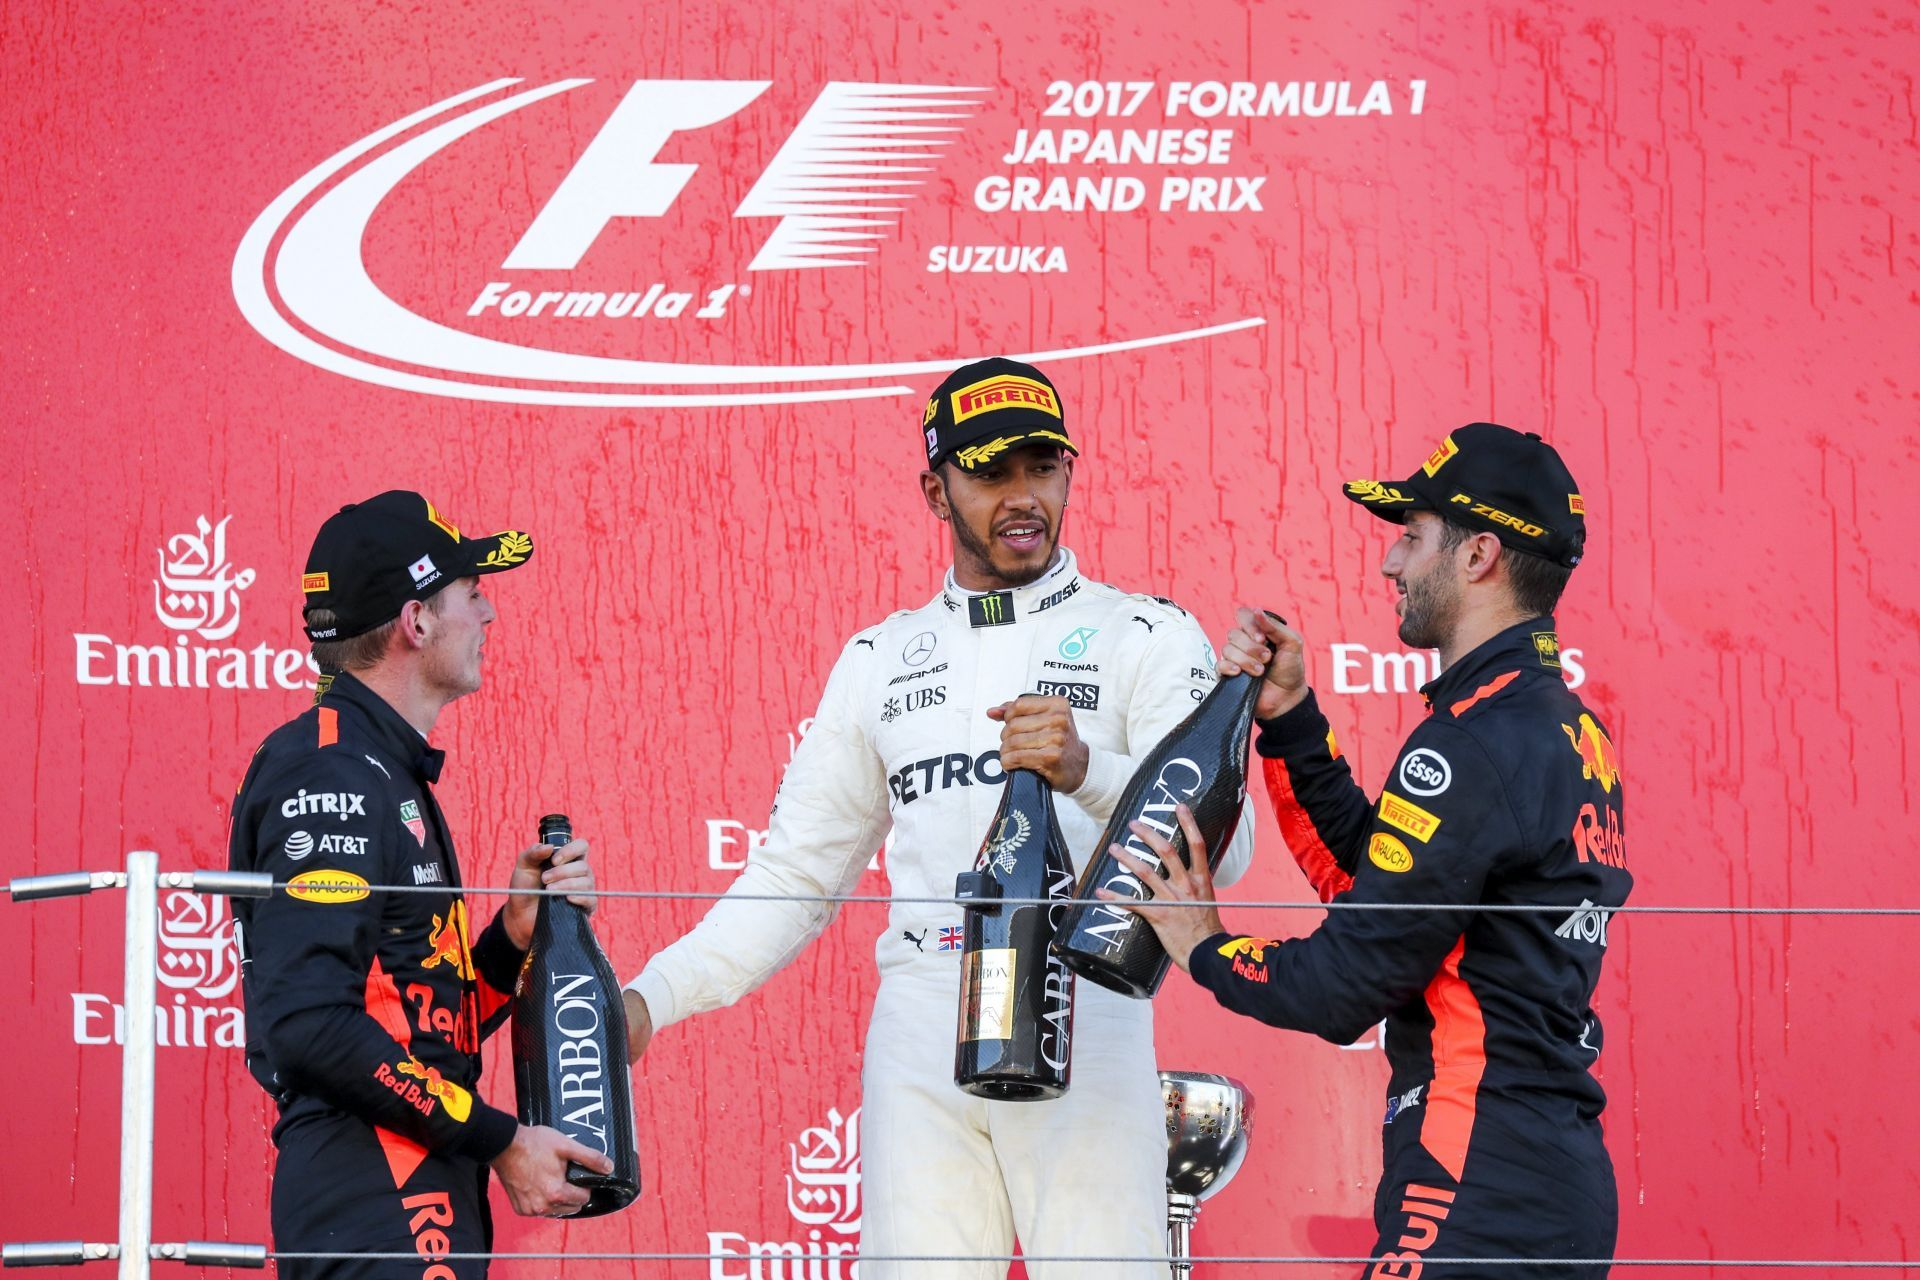 Japan Formula One Grand Prix